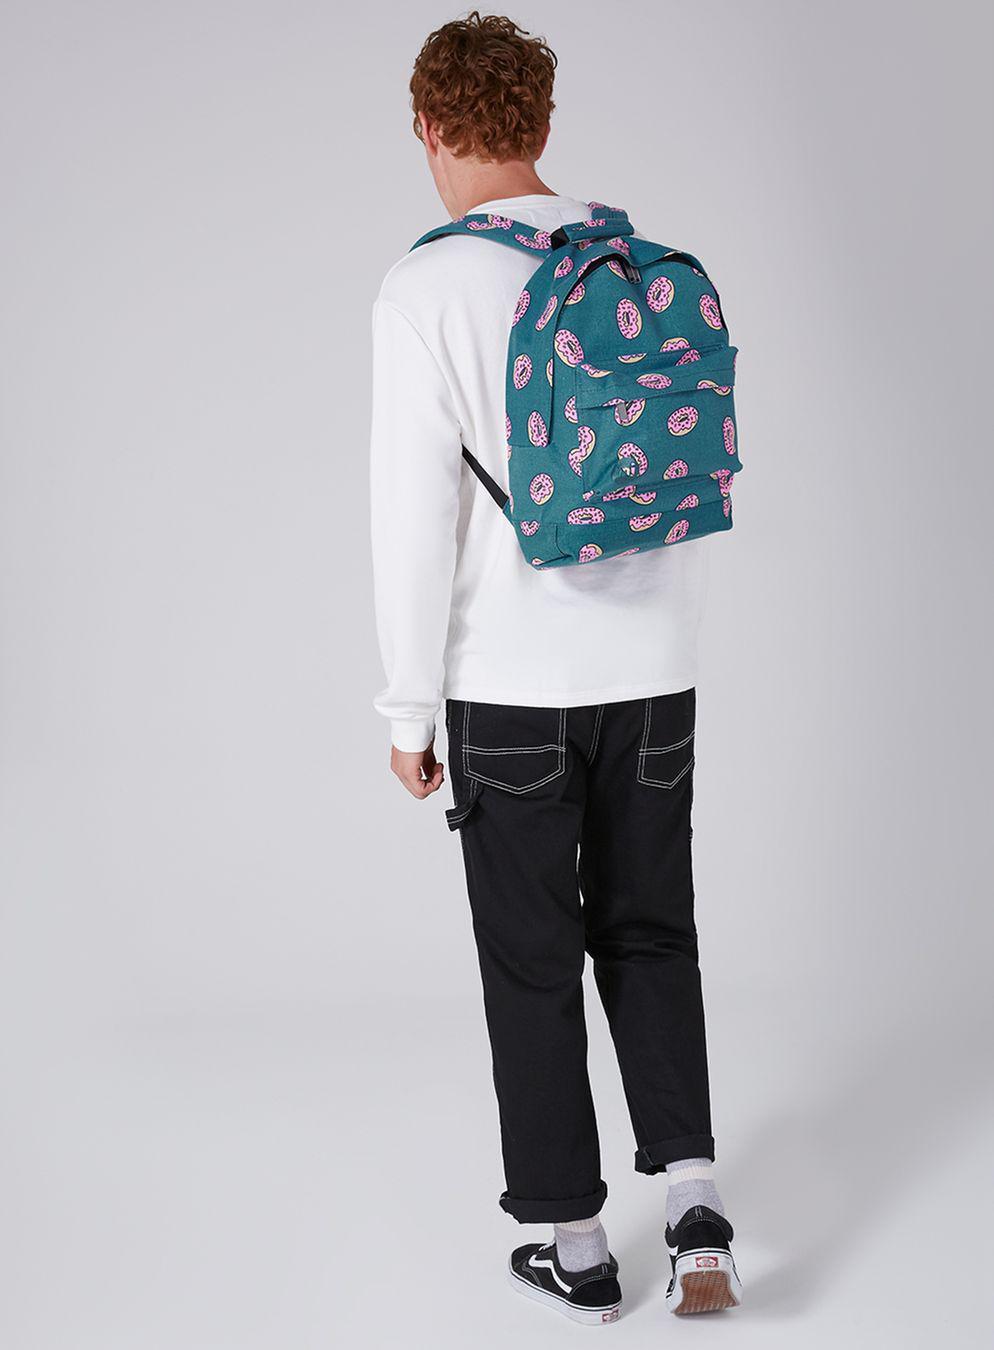 TOPMAN Mi-pac Canvas Doughnut Backpack* in Blue for Men